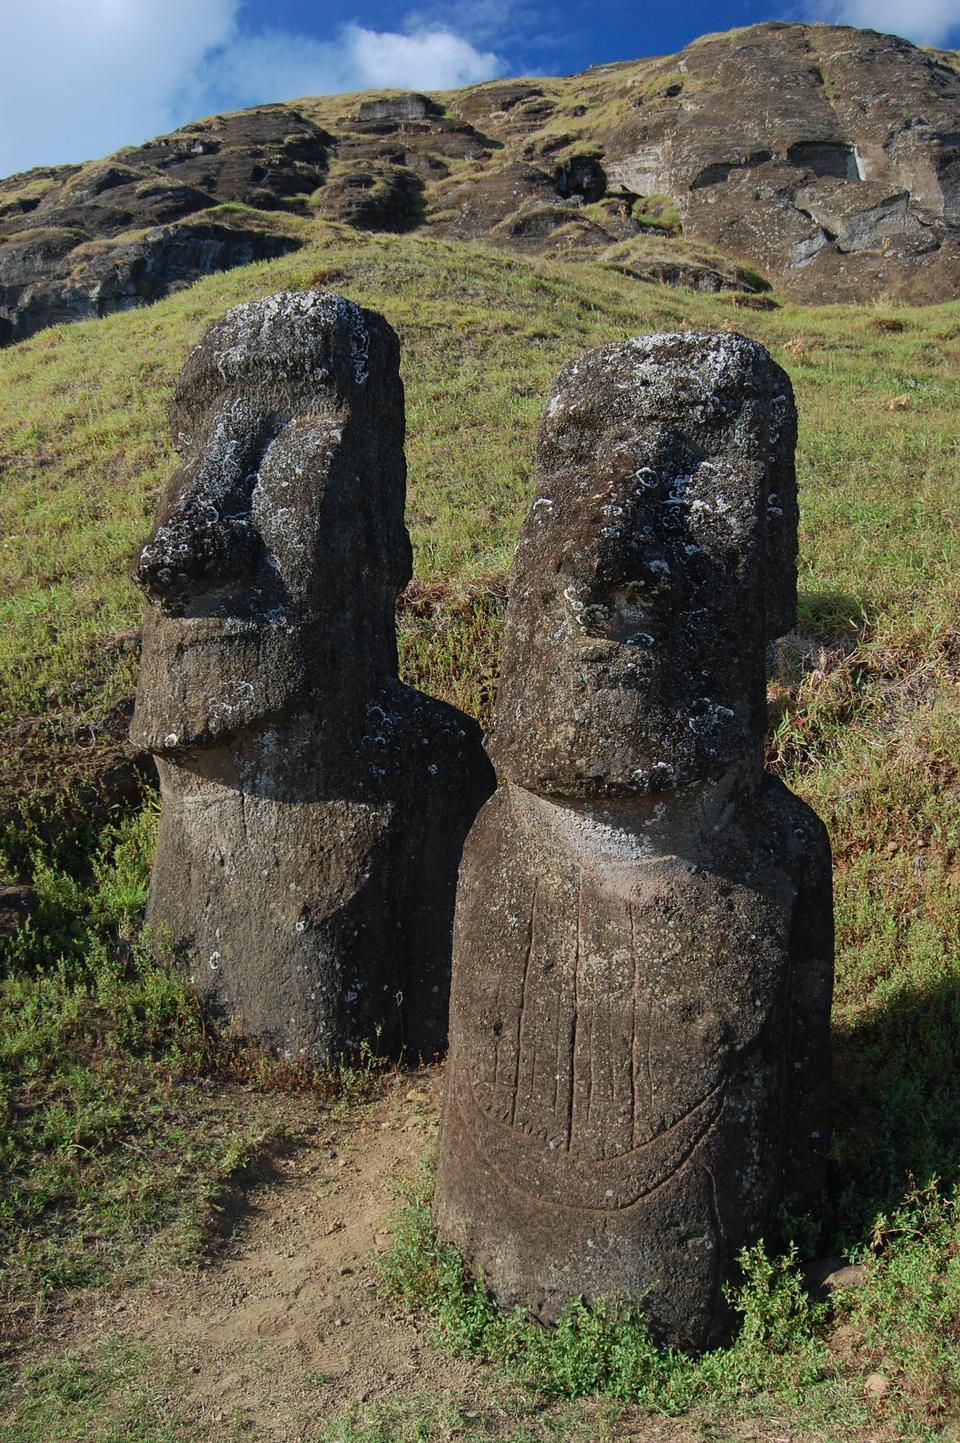 Moai at the Rano Raraku quarry